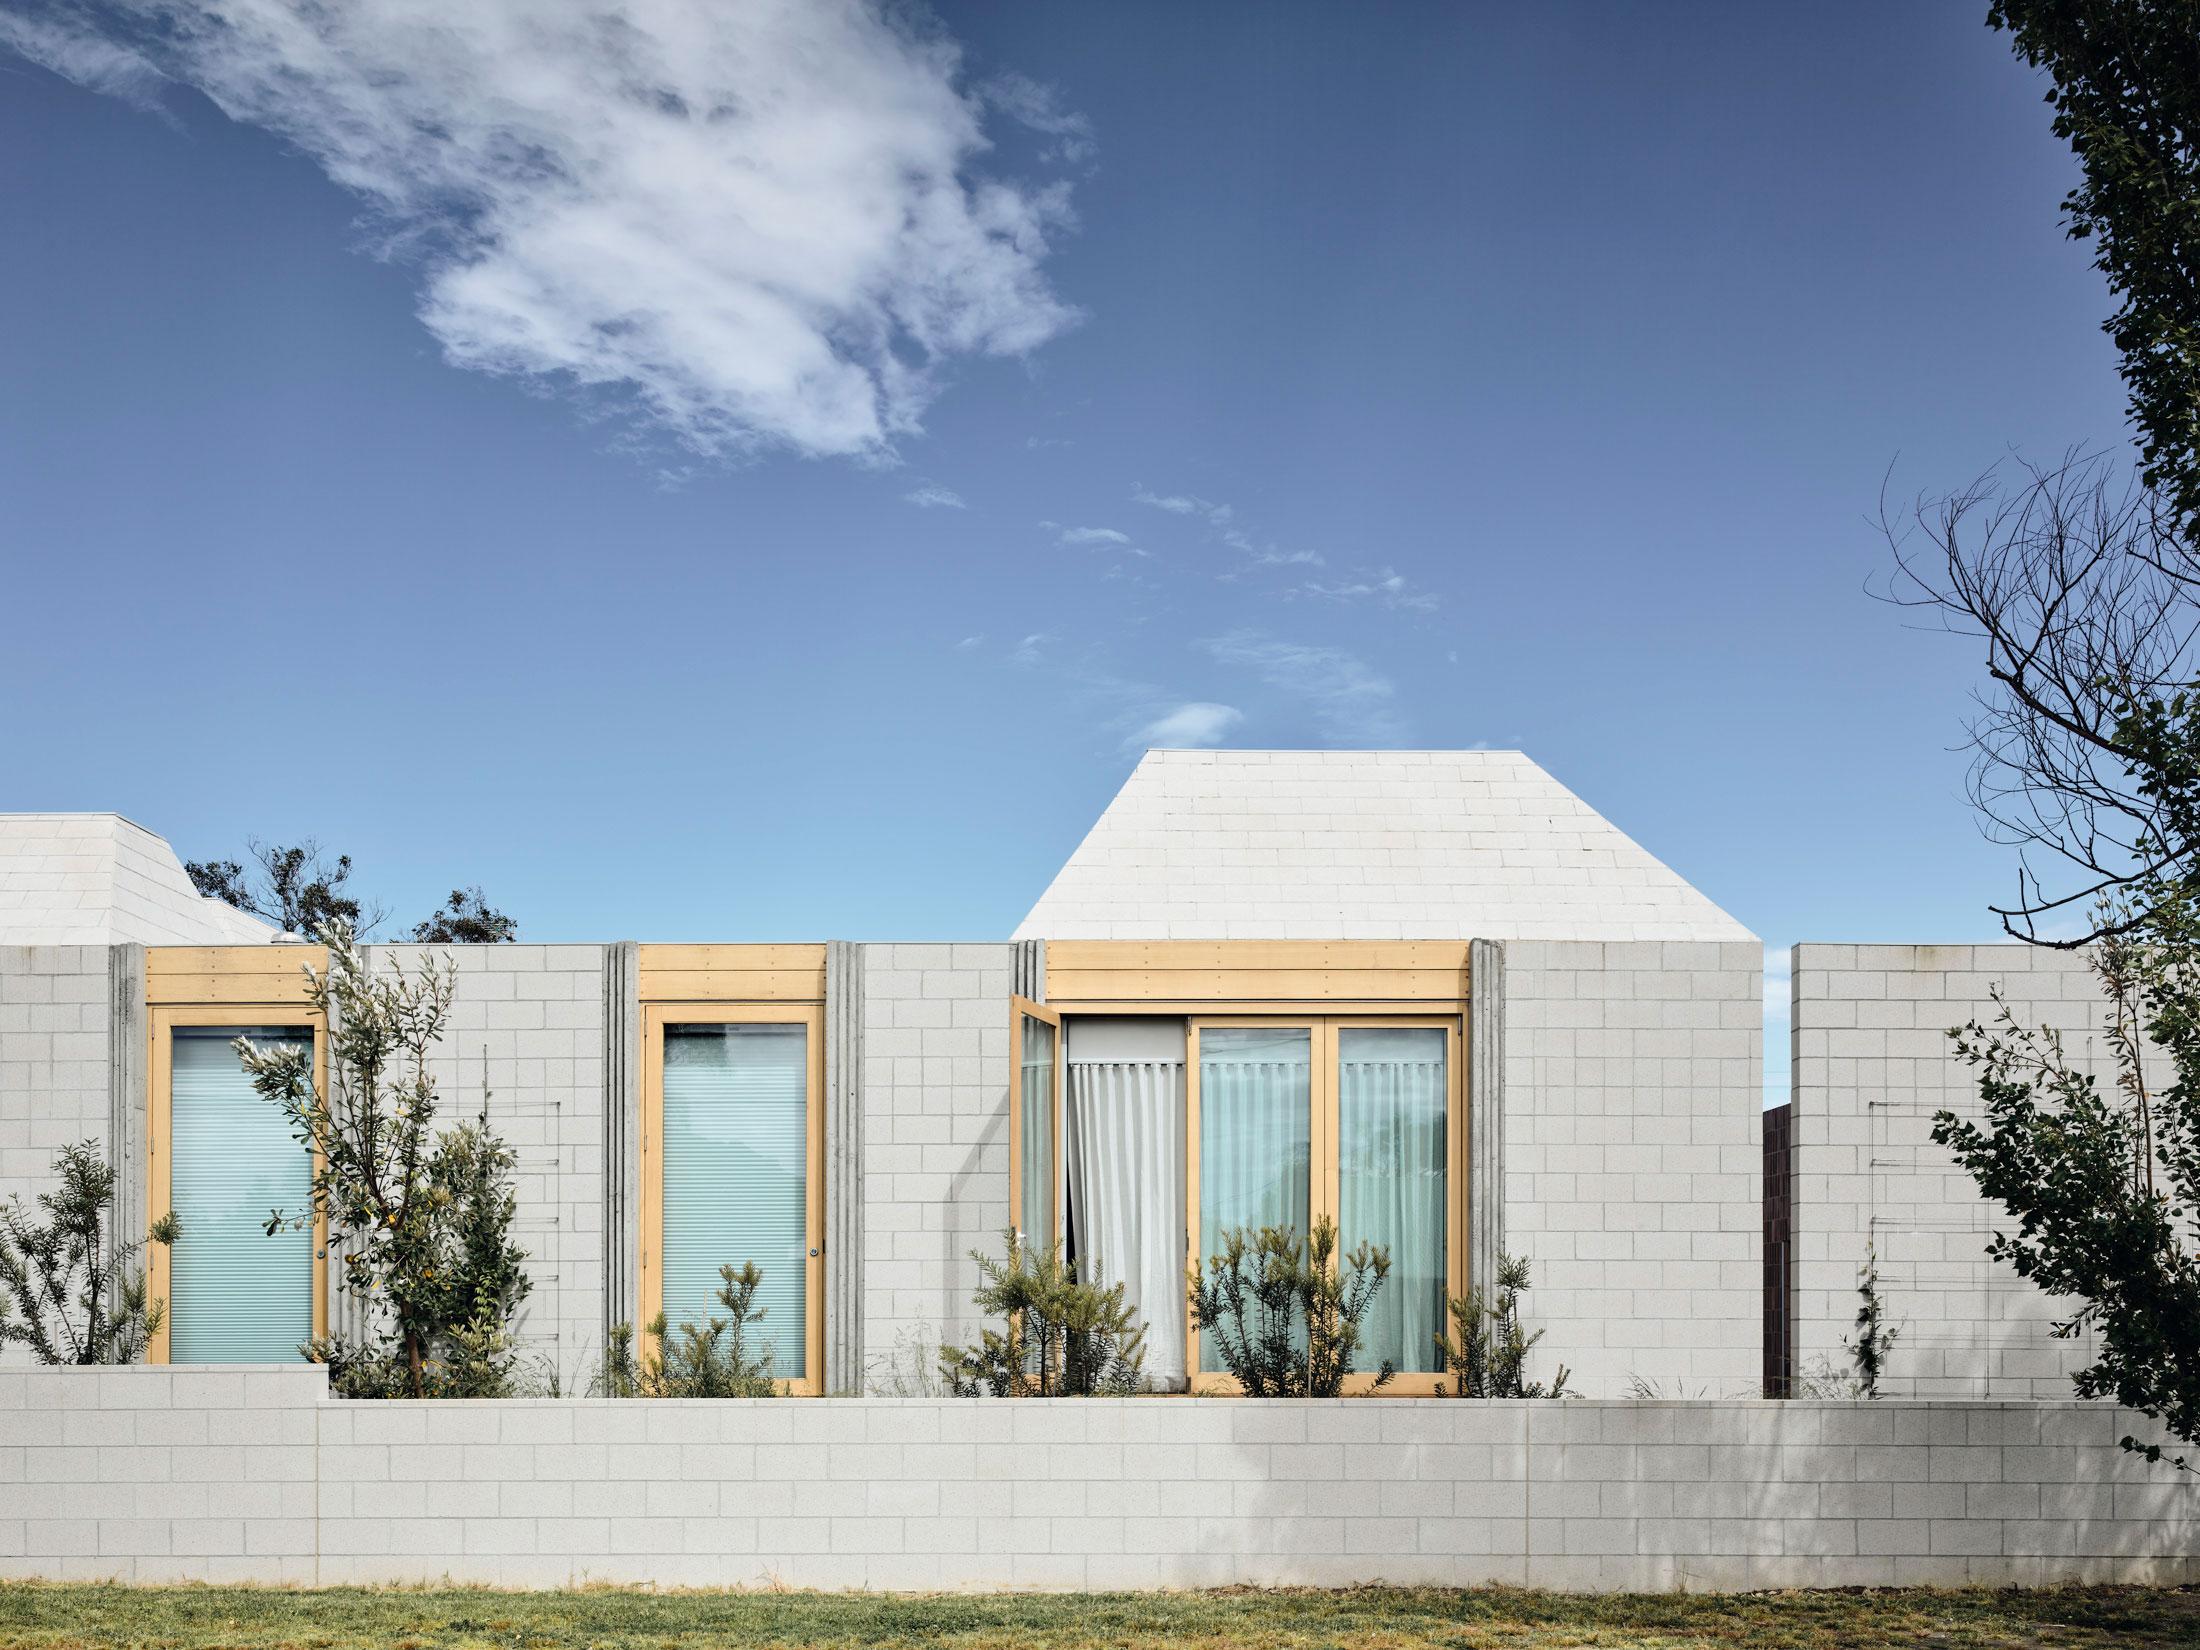 Architects Eat Bellows Beach House Flinders Masonry Architecture Photo Derek Swalwell Yellowtrace 02